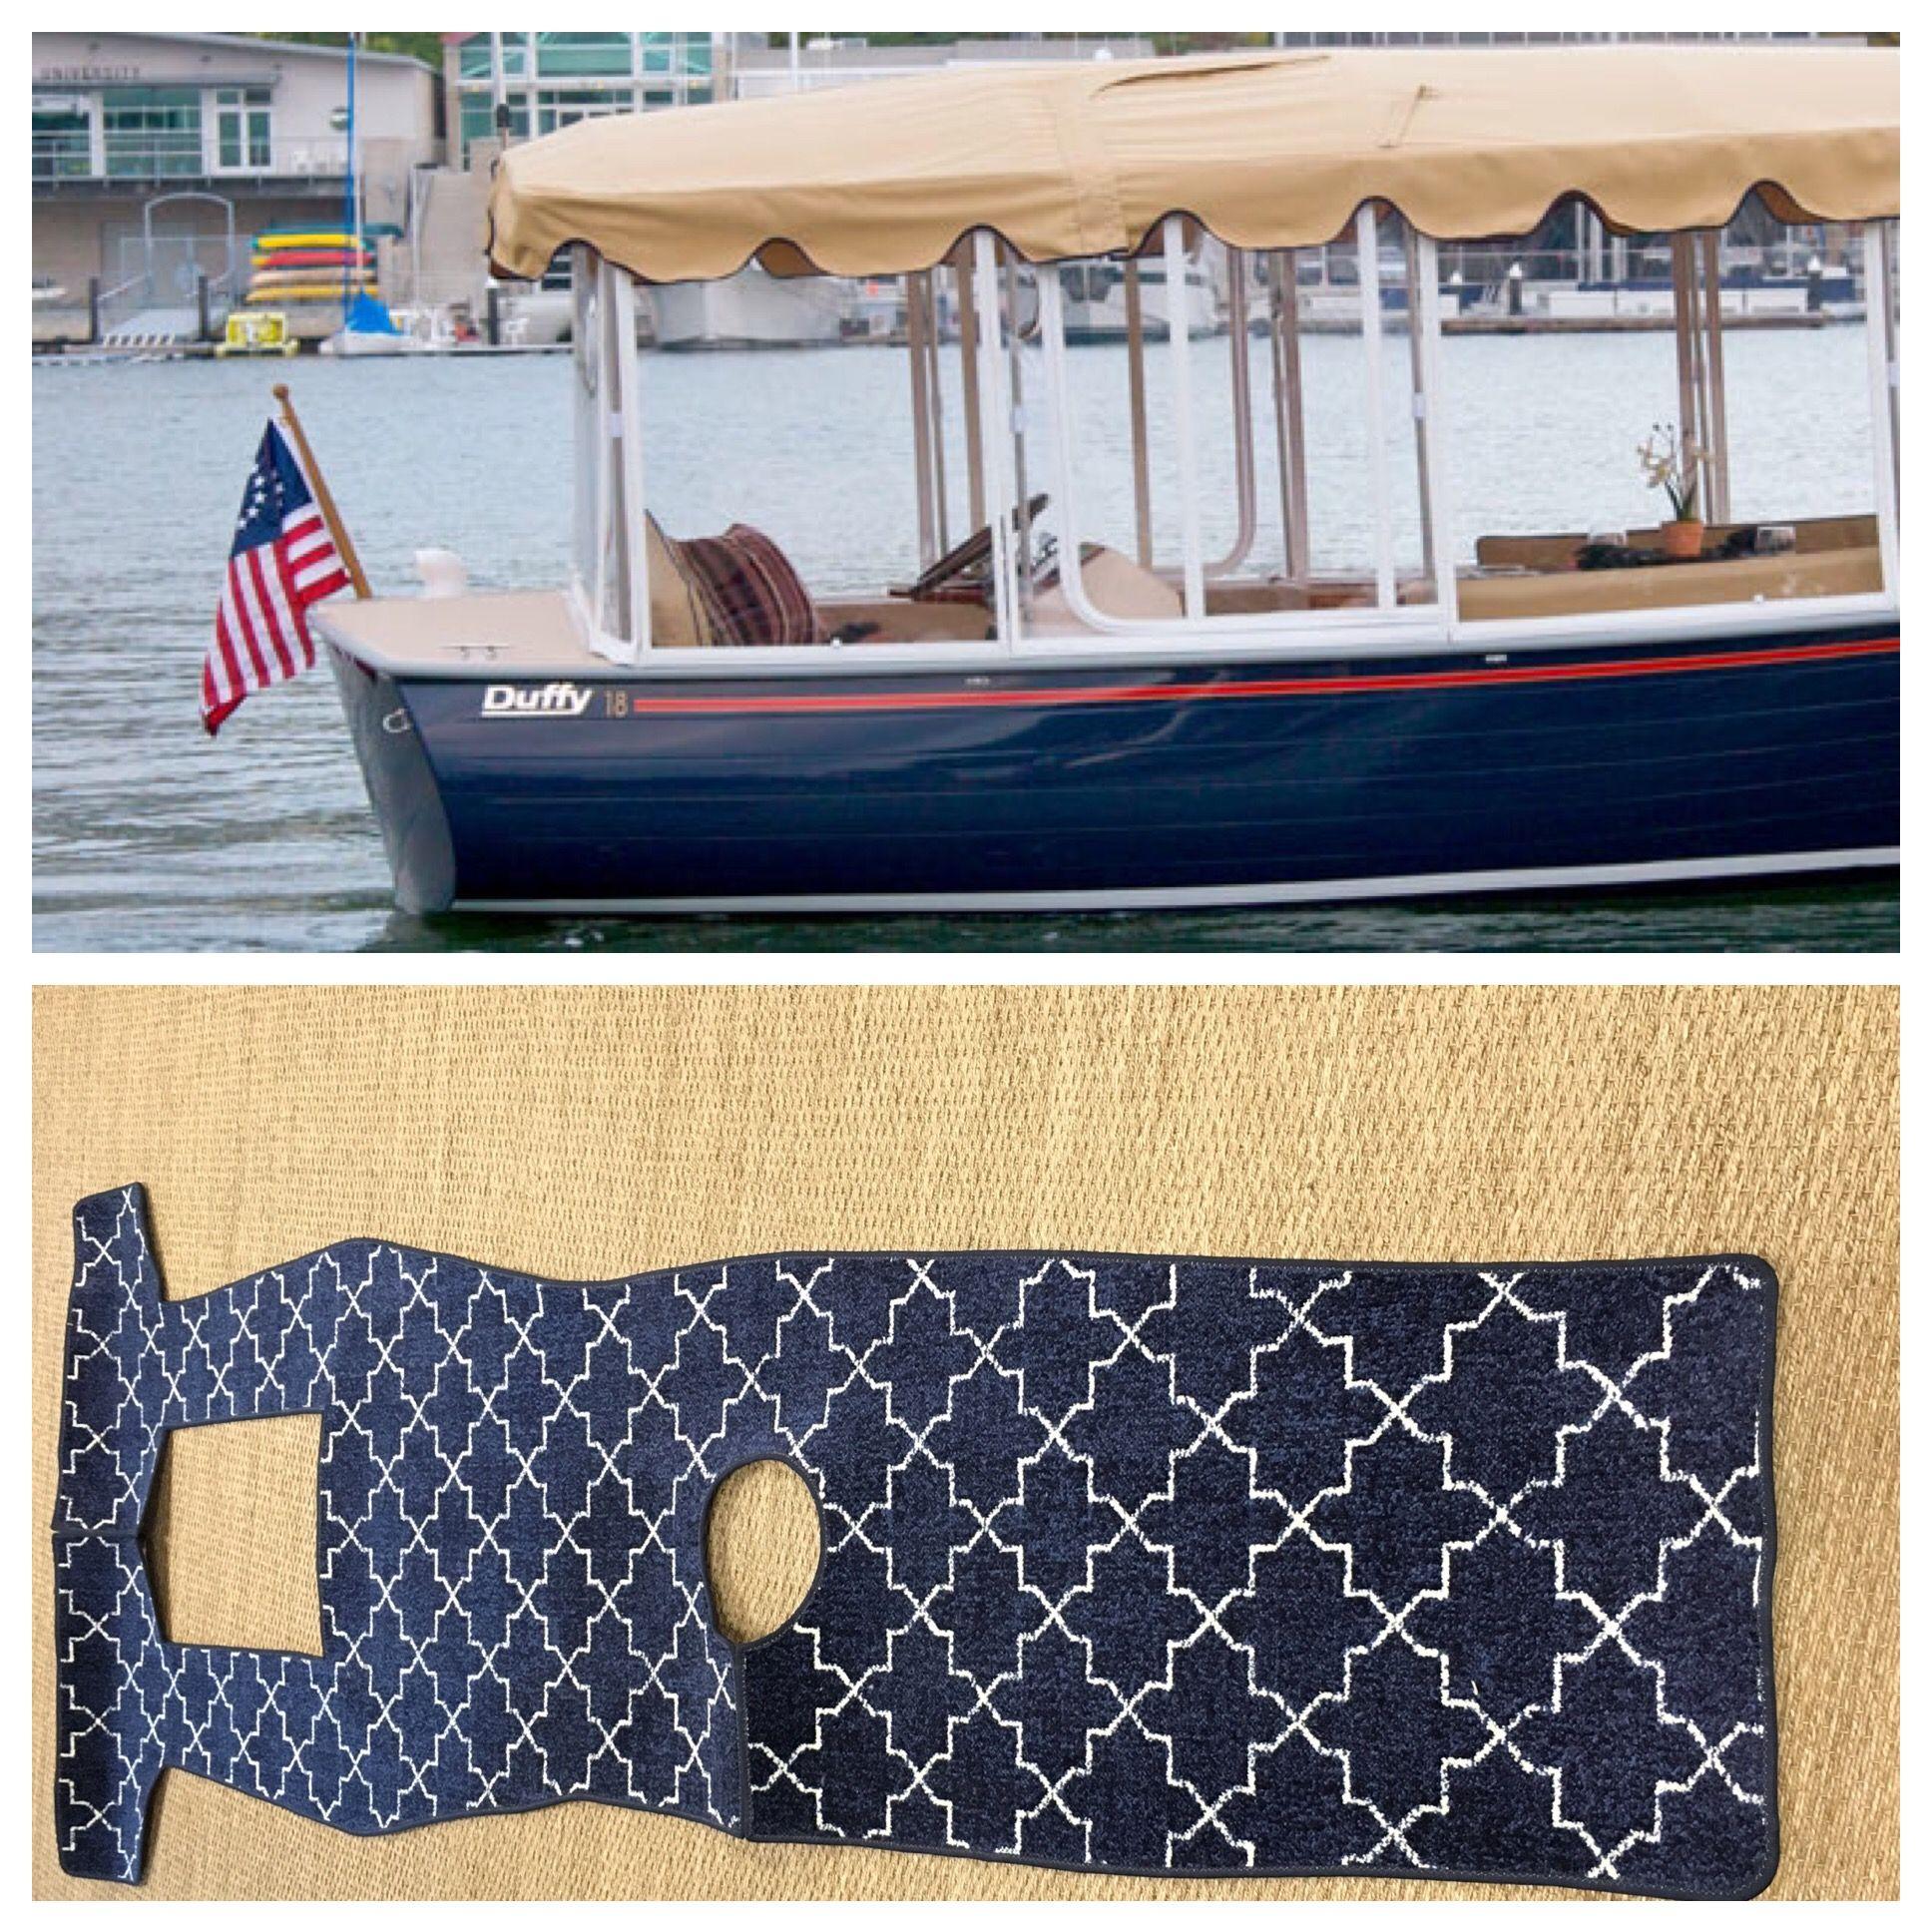 Hemphill S Fine Rugs And Quality Flooring In Orange County Boat Carpet Boat Decor Fine Rugs